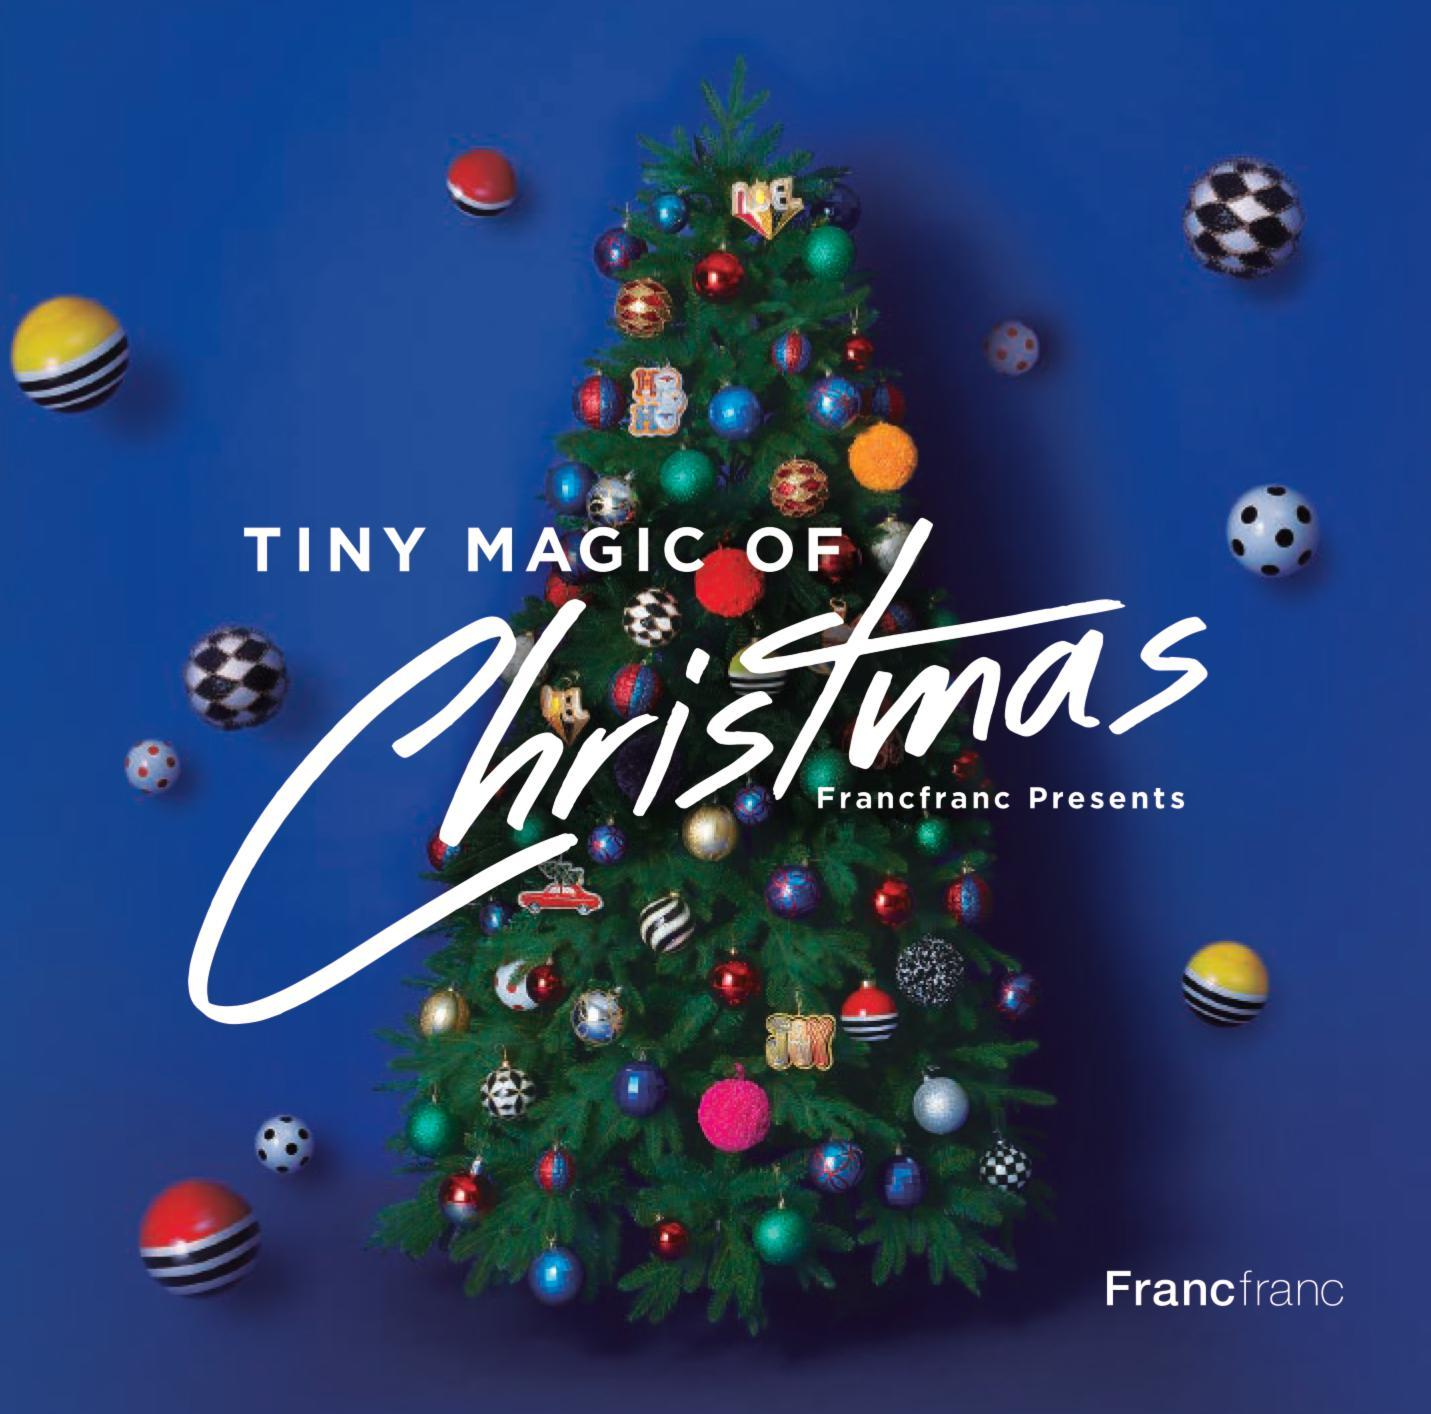 Francfranc Presents『TINY MAGIC OF CHRISTMAS』